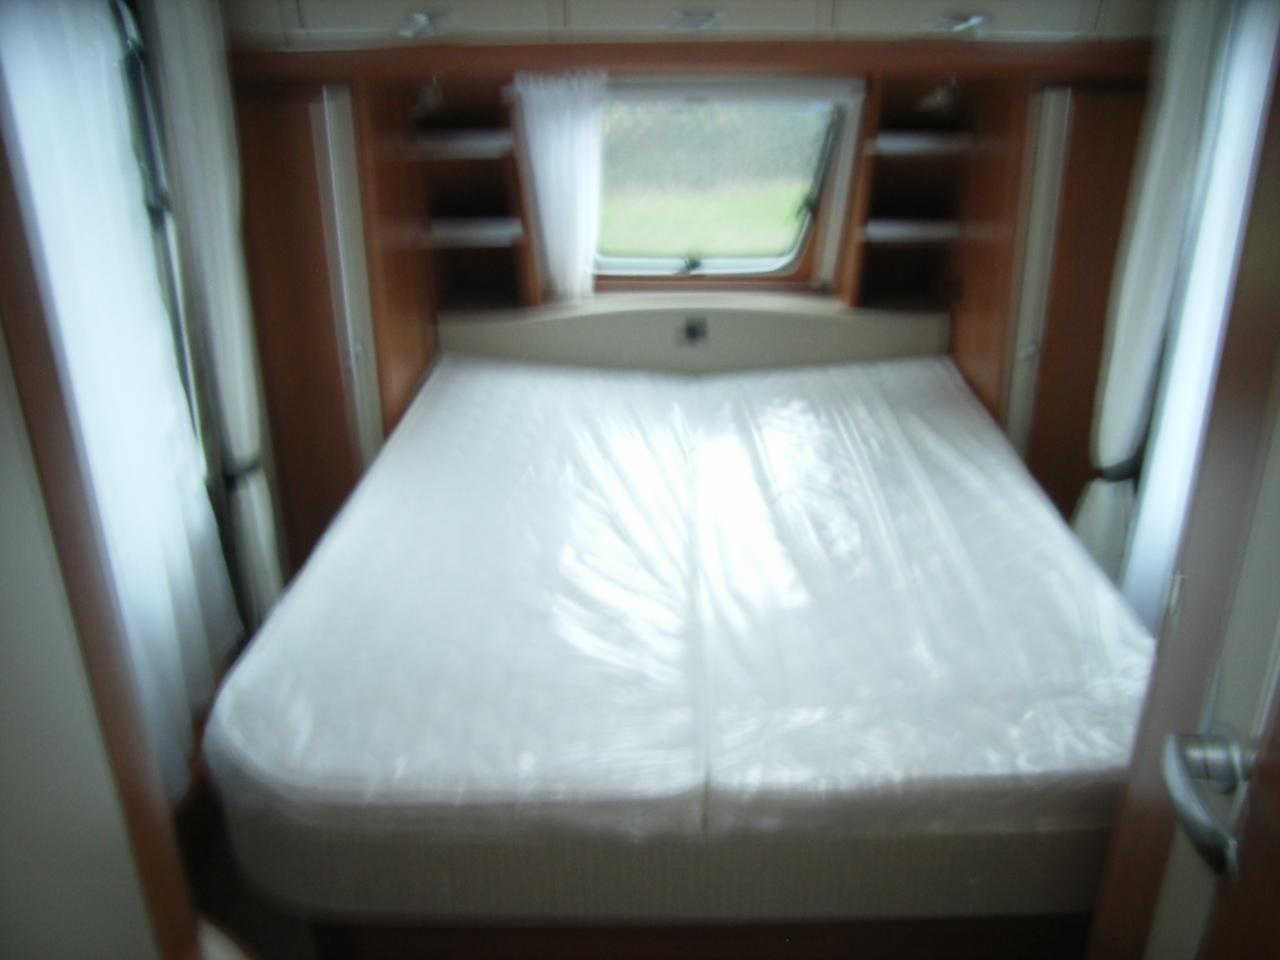 hobby 490 sff neuf de 2012 caravane en vente olemps aveyron 12. Black Bedroom Furniture Sets. Home Design Ideas